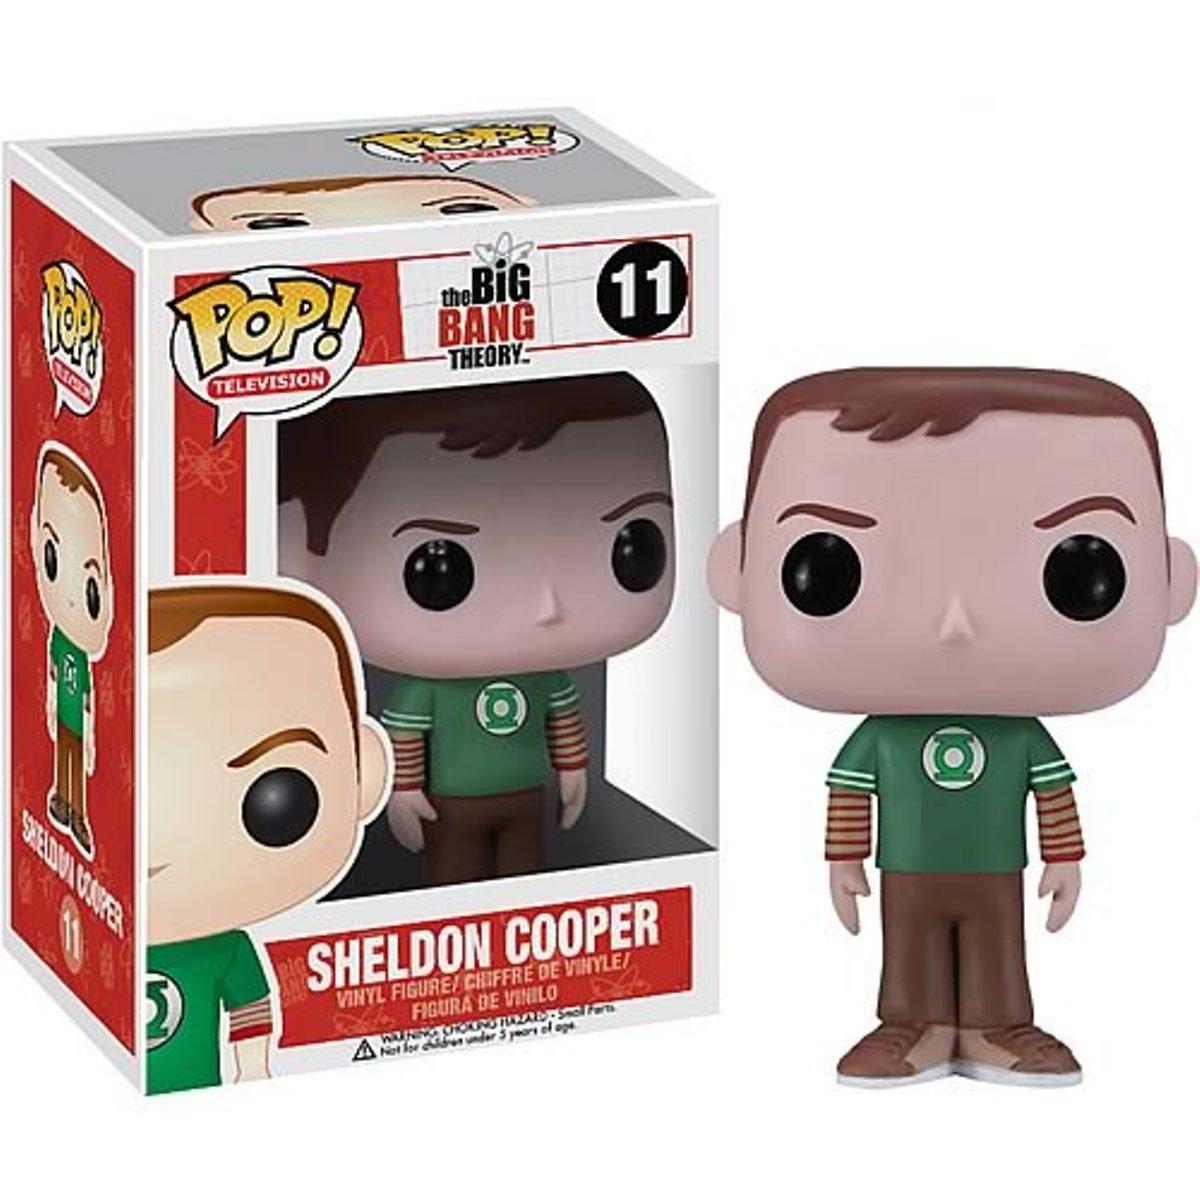 Funko Pop! The Big Bang Theory Sheldon Cooper